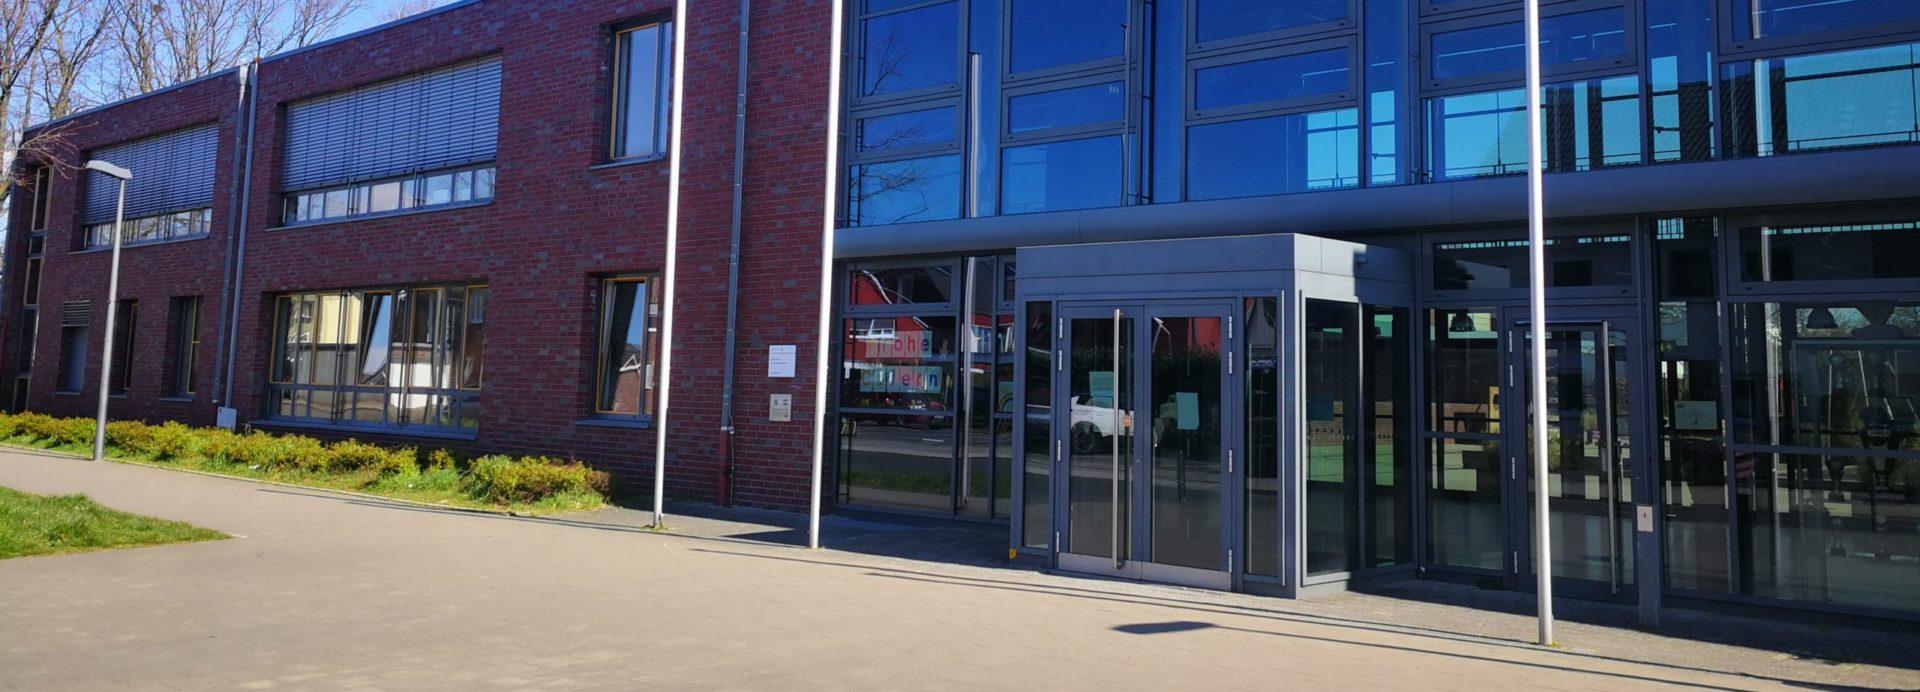 Olympia-Schule Köln Widdersdorf